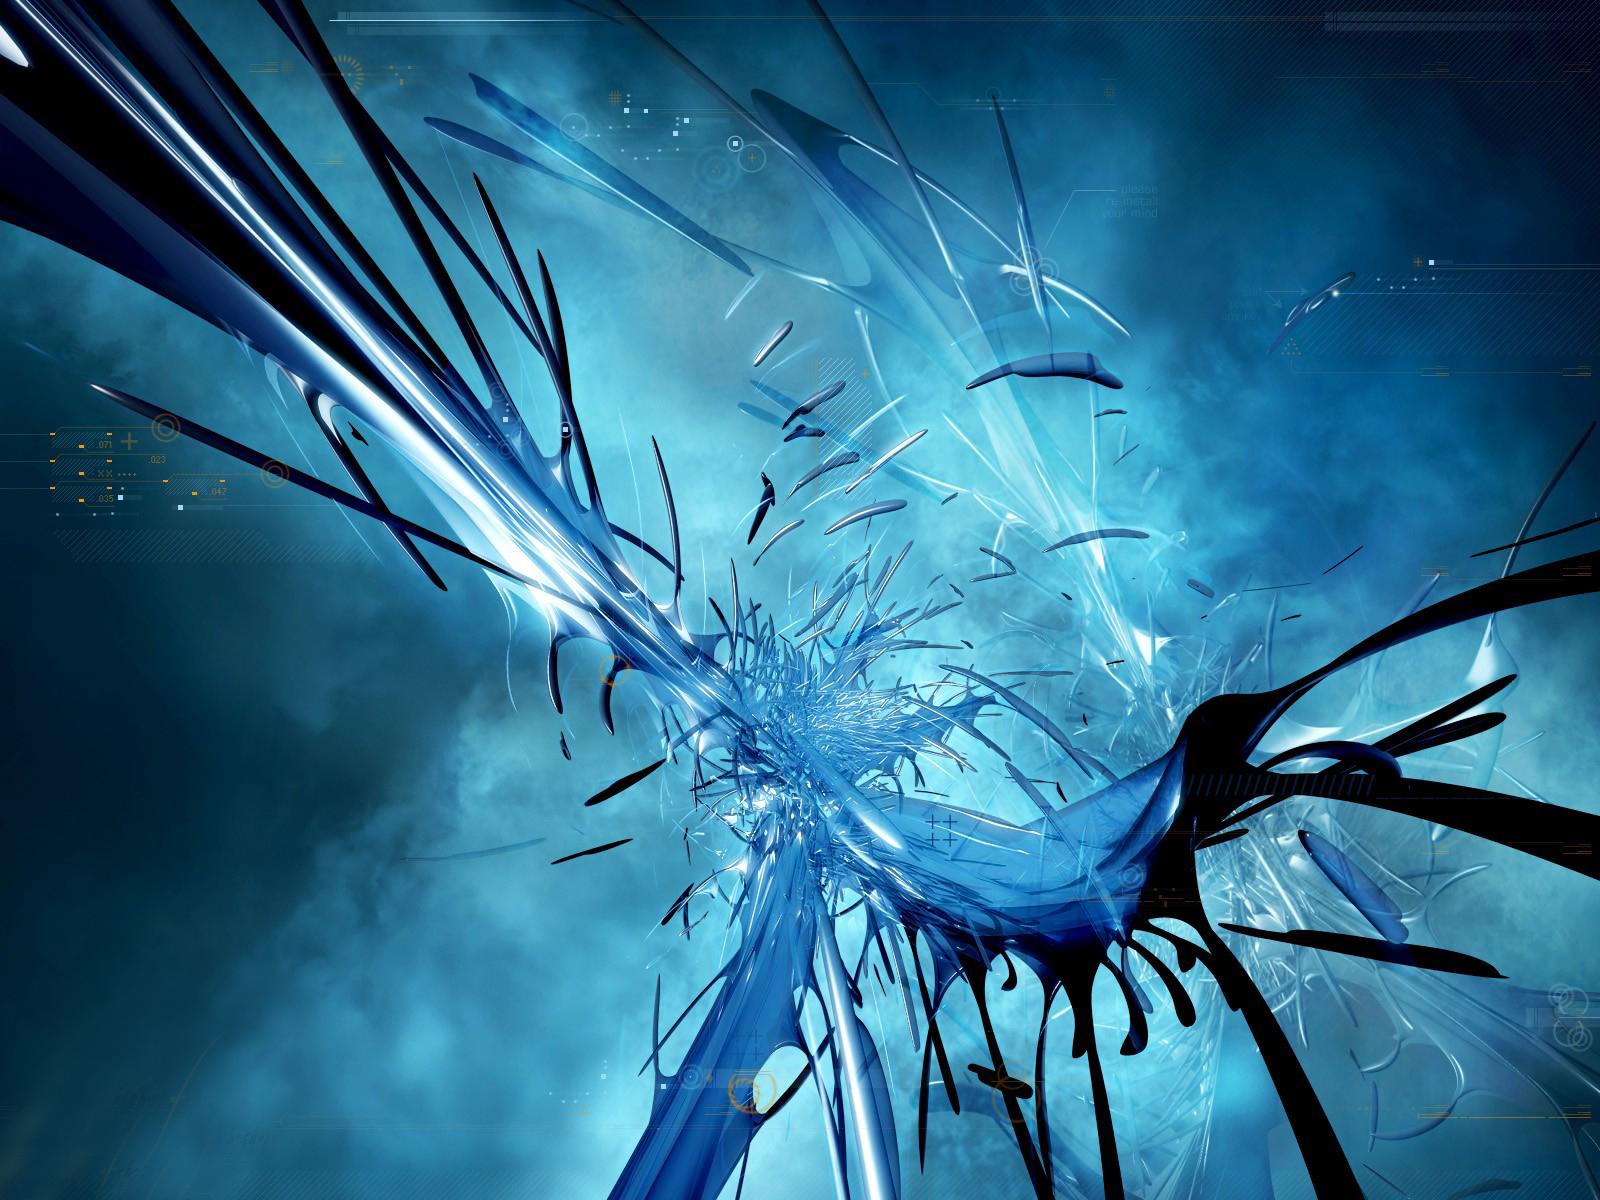 Home abstract 3d abstract digital art HD widescreen wallpapers 1600x1200